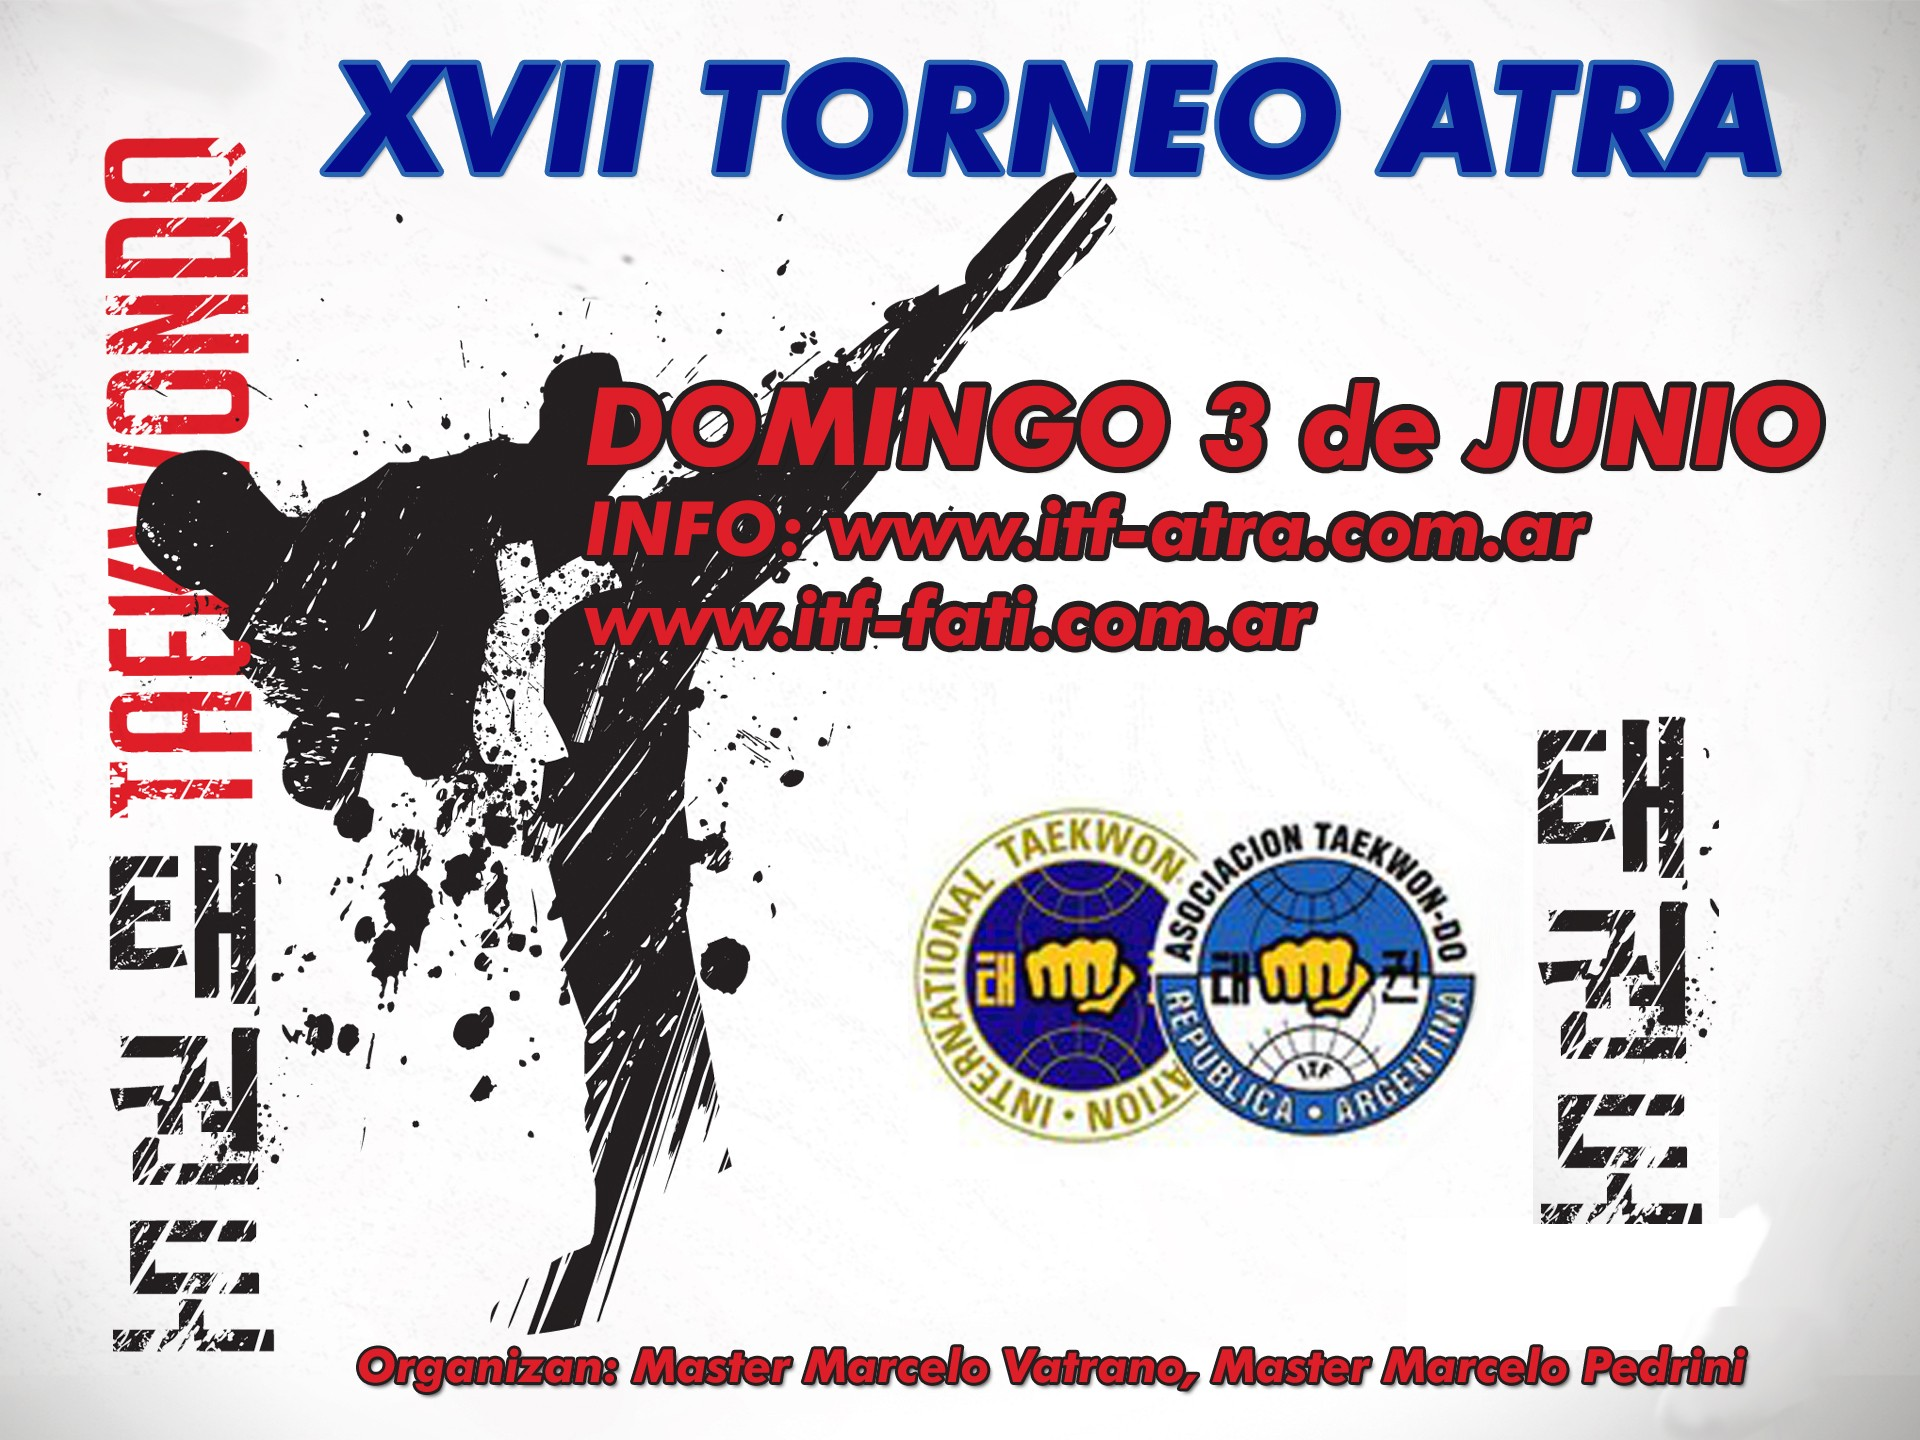 17 ¦ Torneo ATRA 2012